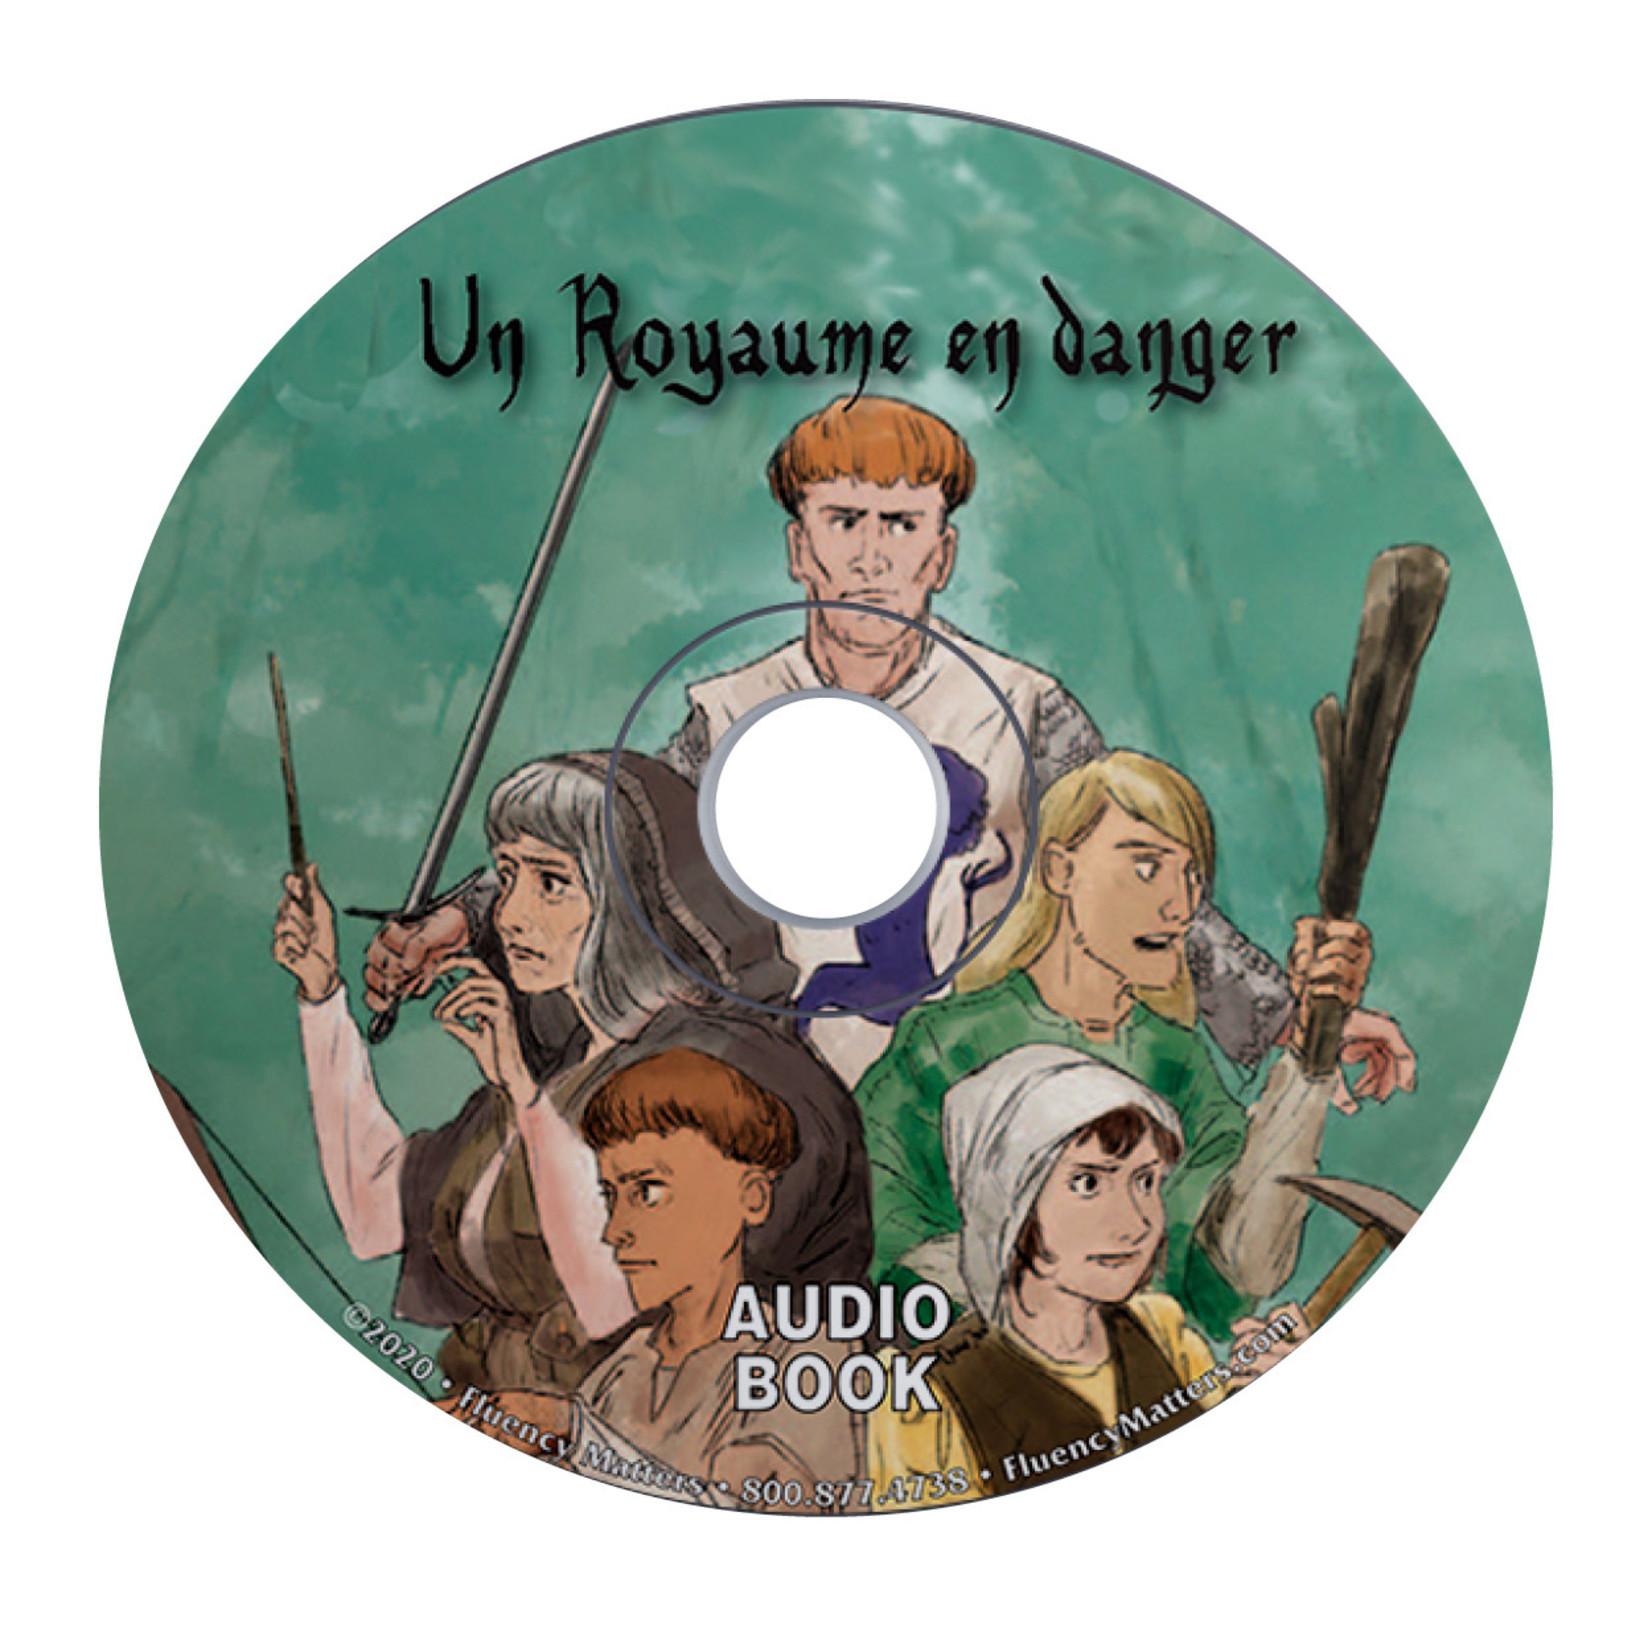 Fluency Matters Un royaume en danger - Audiobook